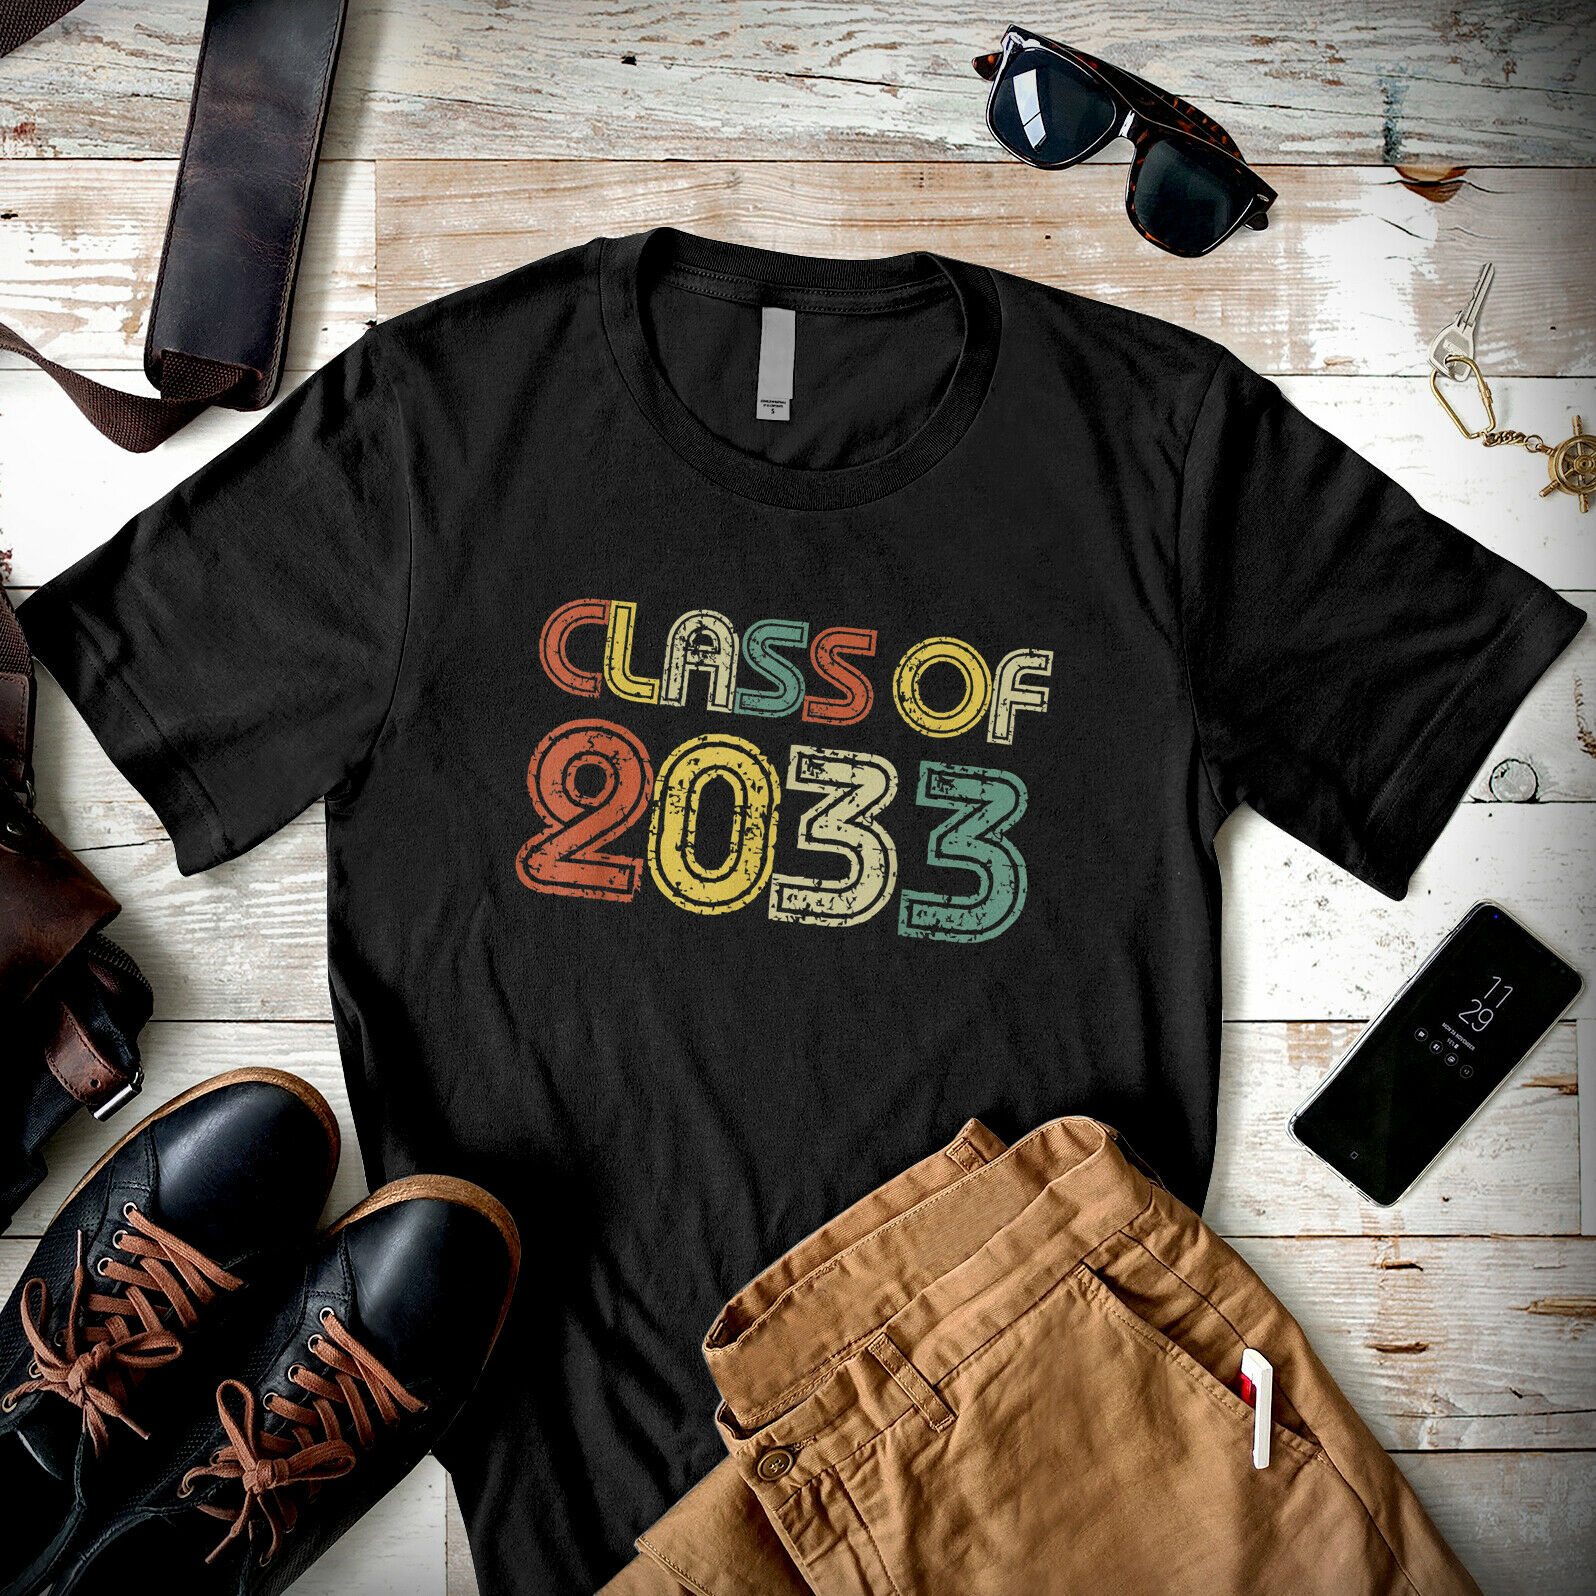 Class Of 2033 Grow With Me Future Graduates Retro Men T Shirt Cotton S 5Xl Black